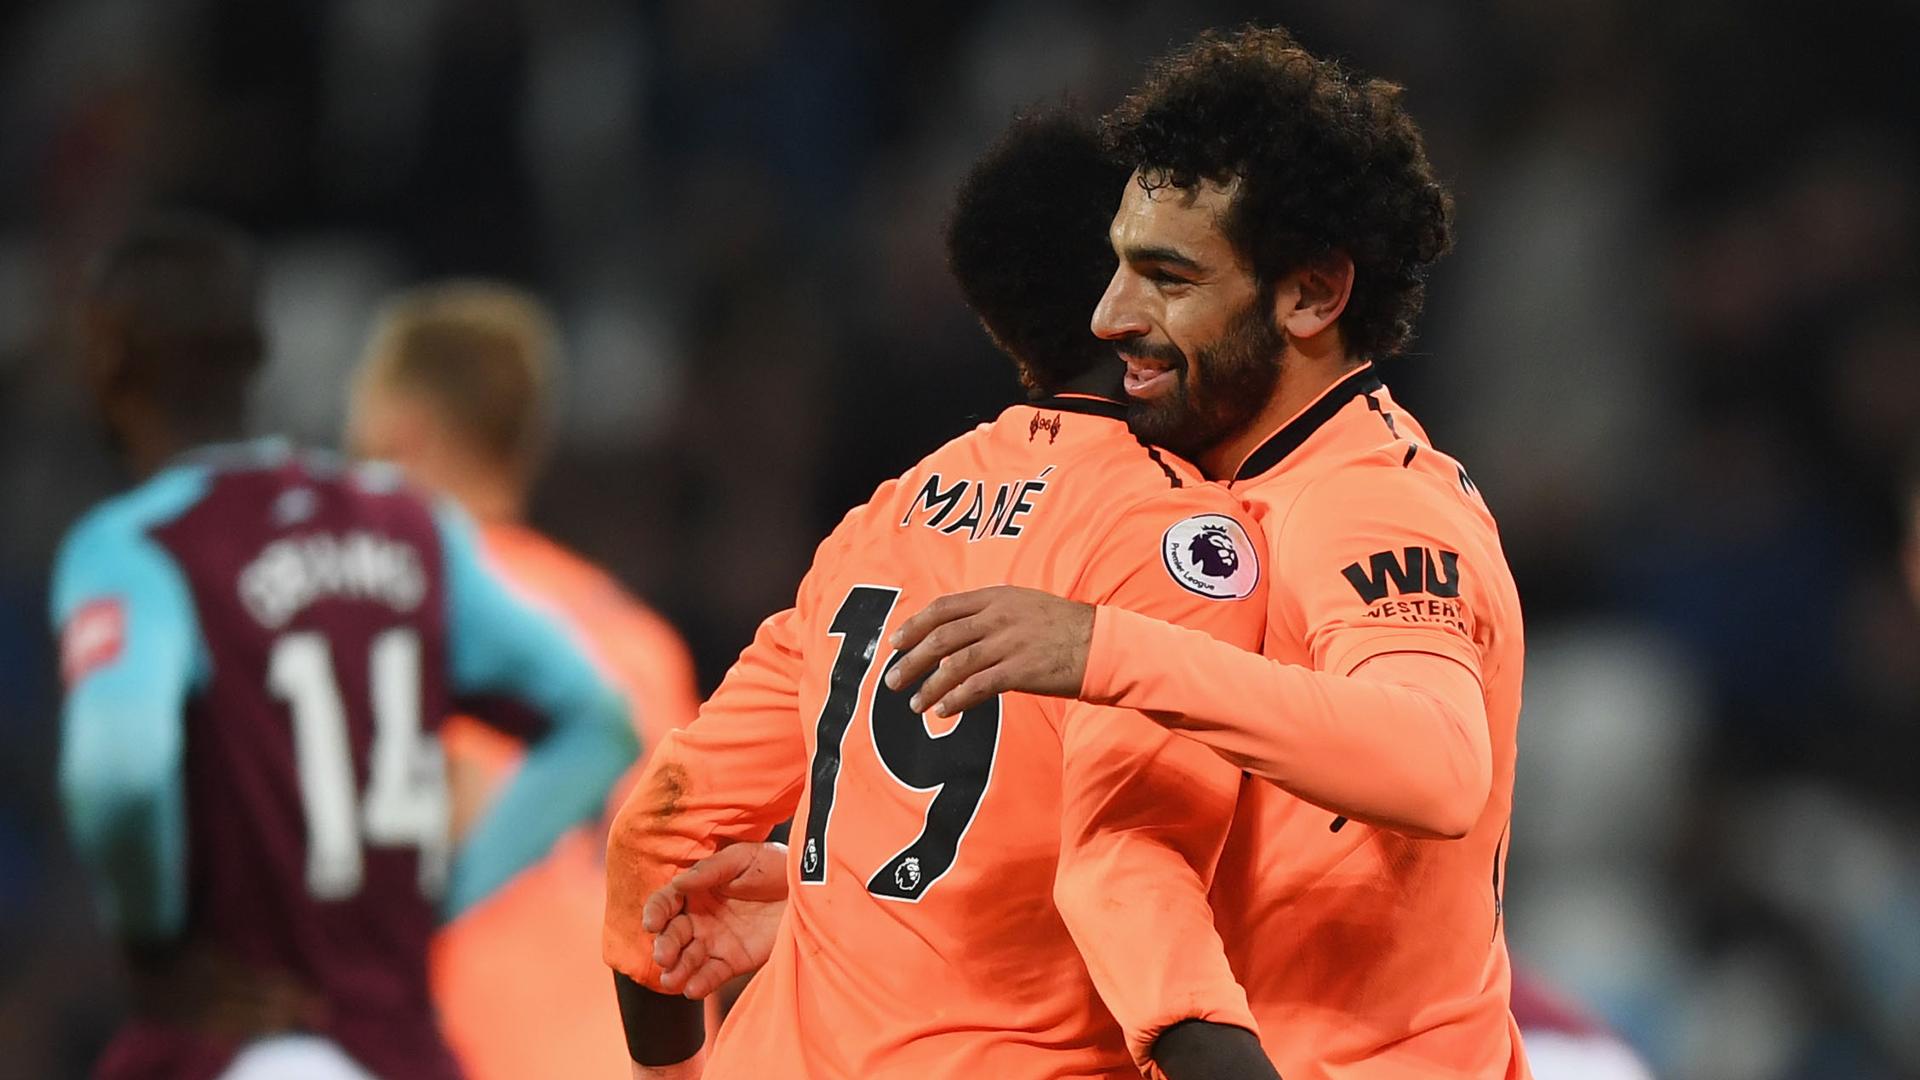 Salah Mane Liverpool 2017-18